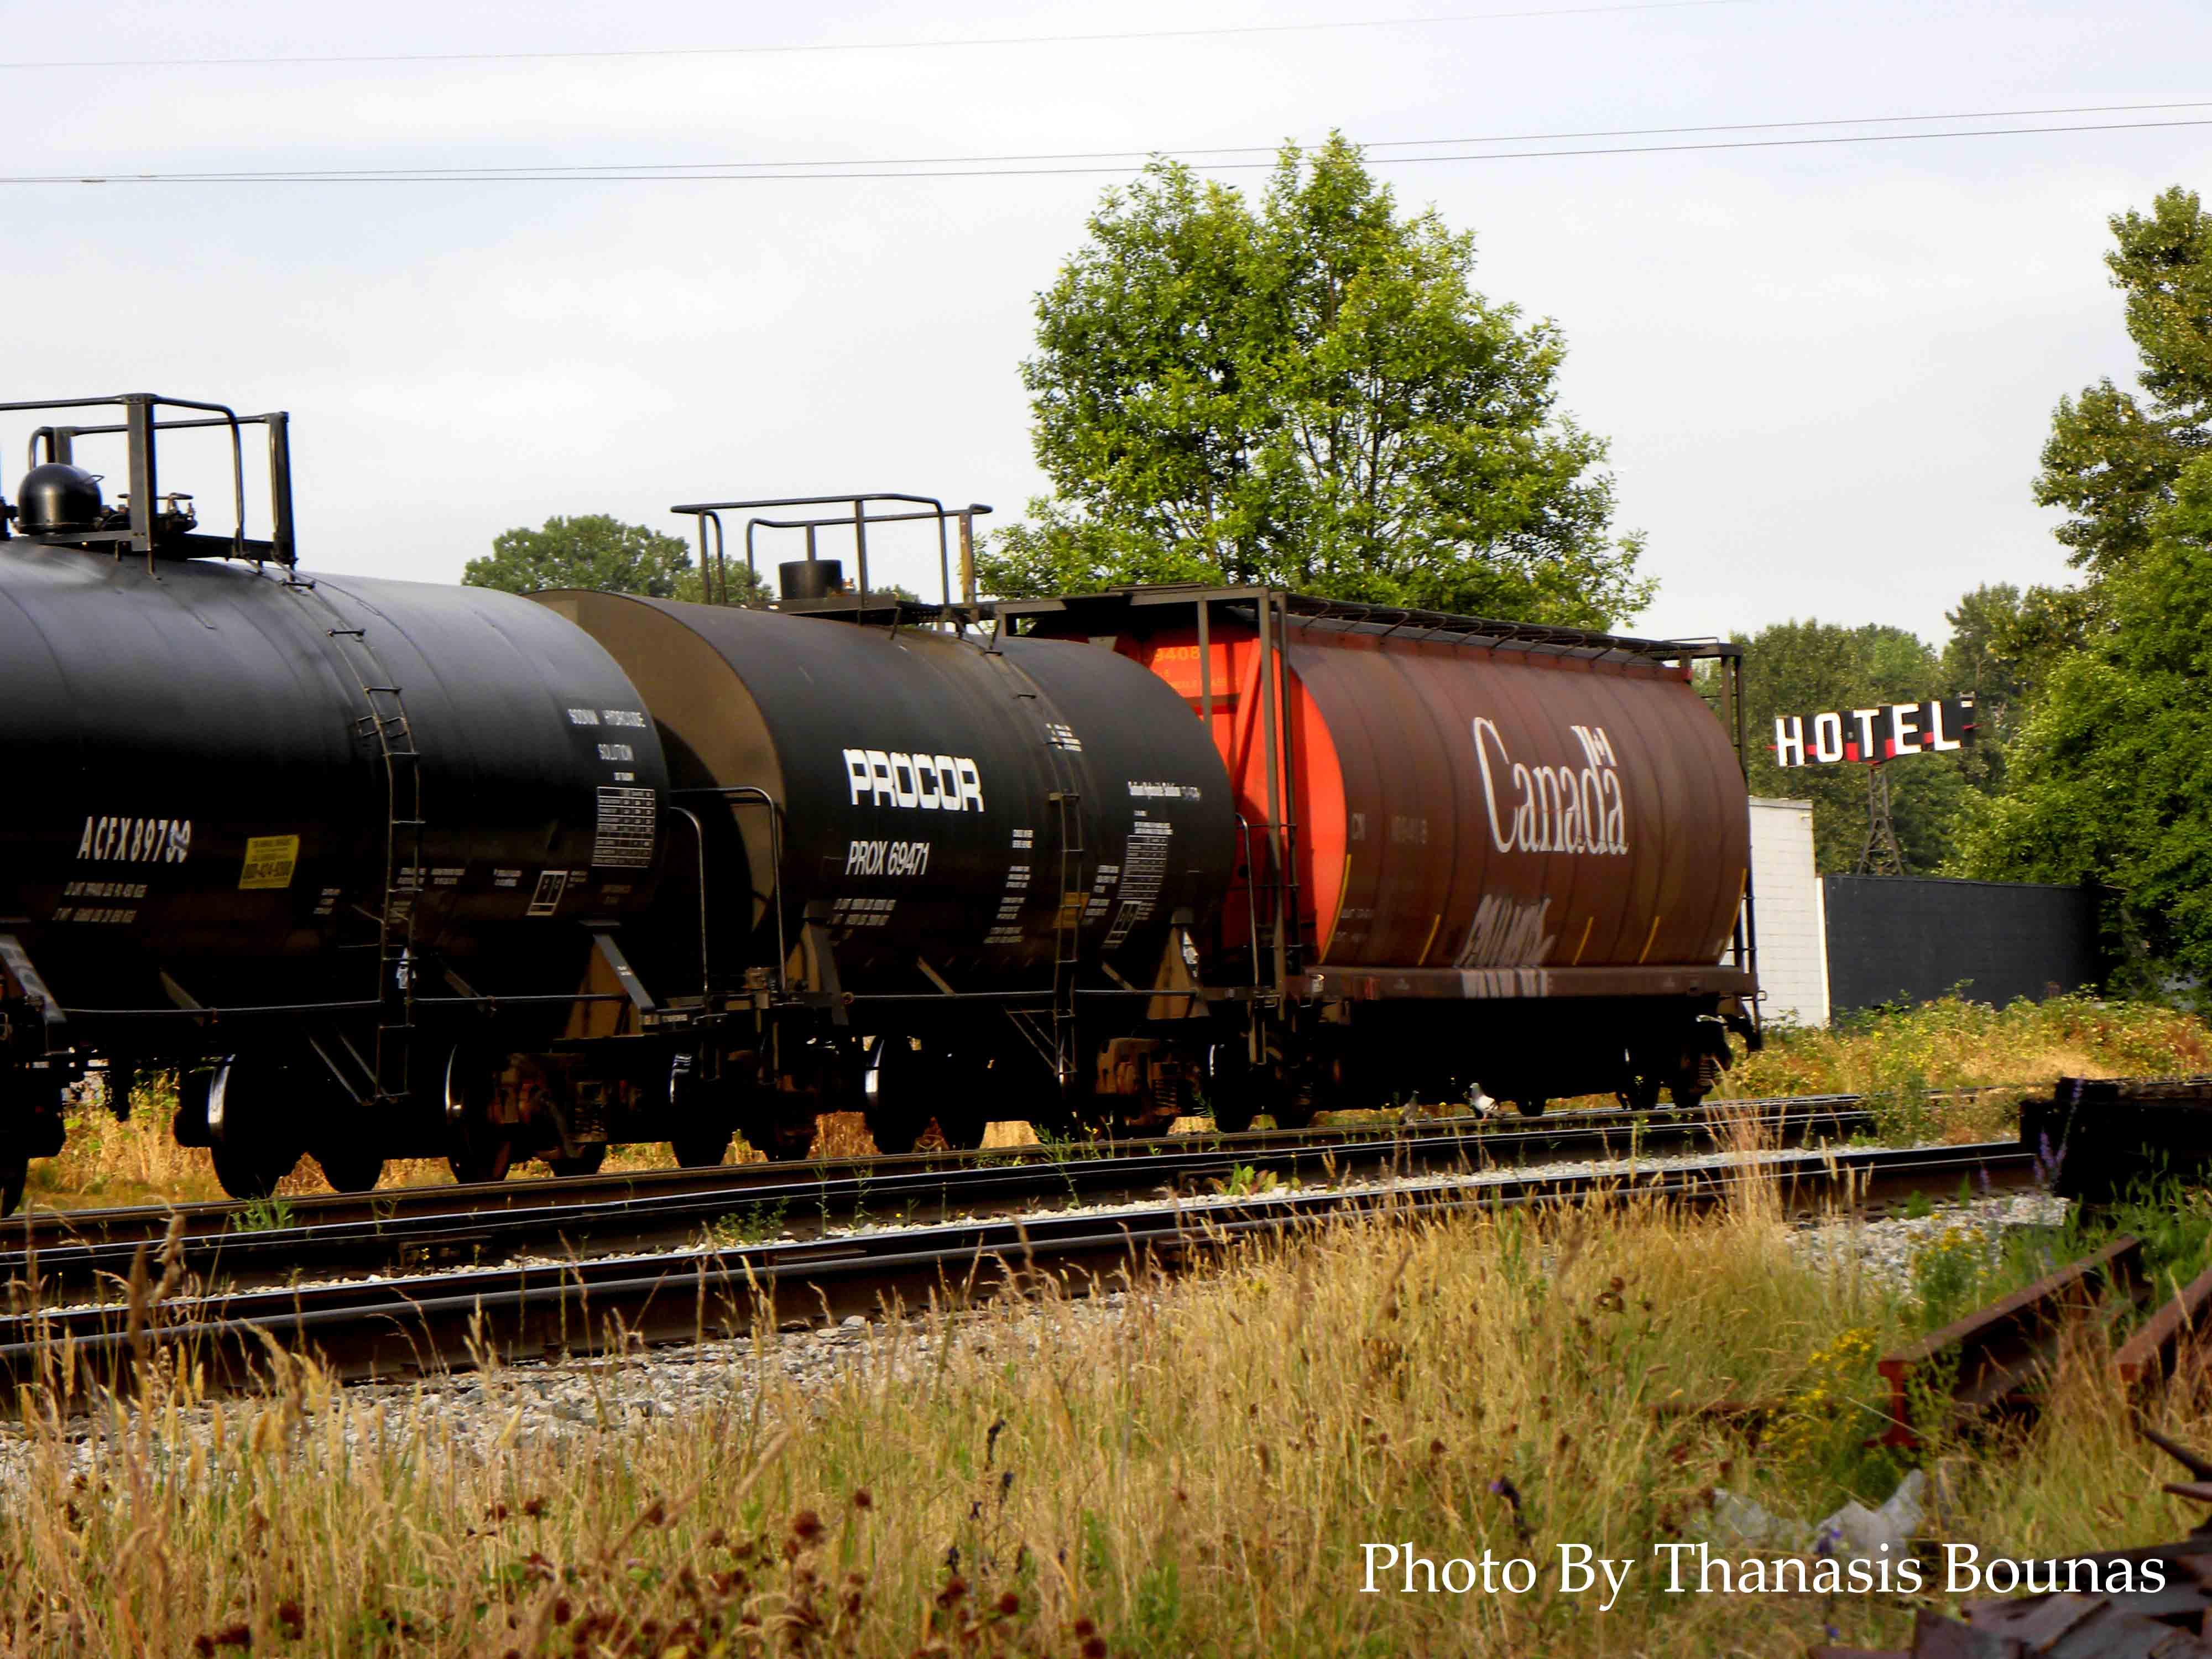 5 Trains Beautiful British Columbia Photo By Thanasis Bounas